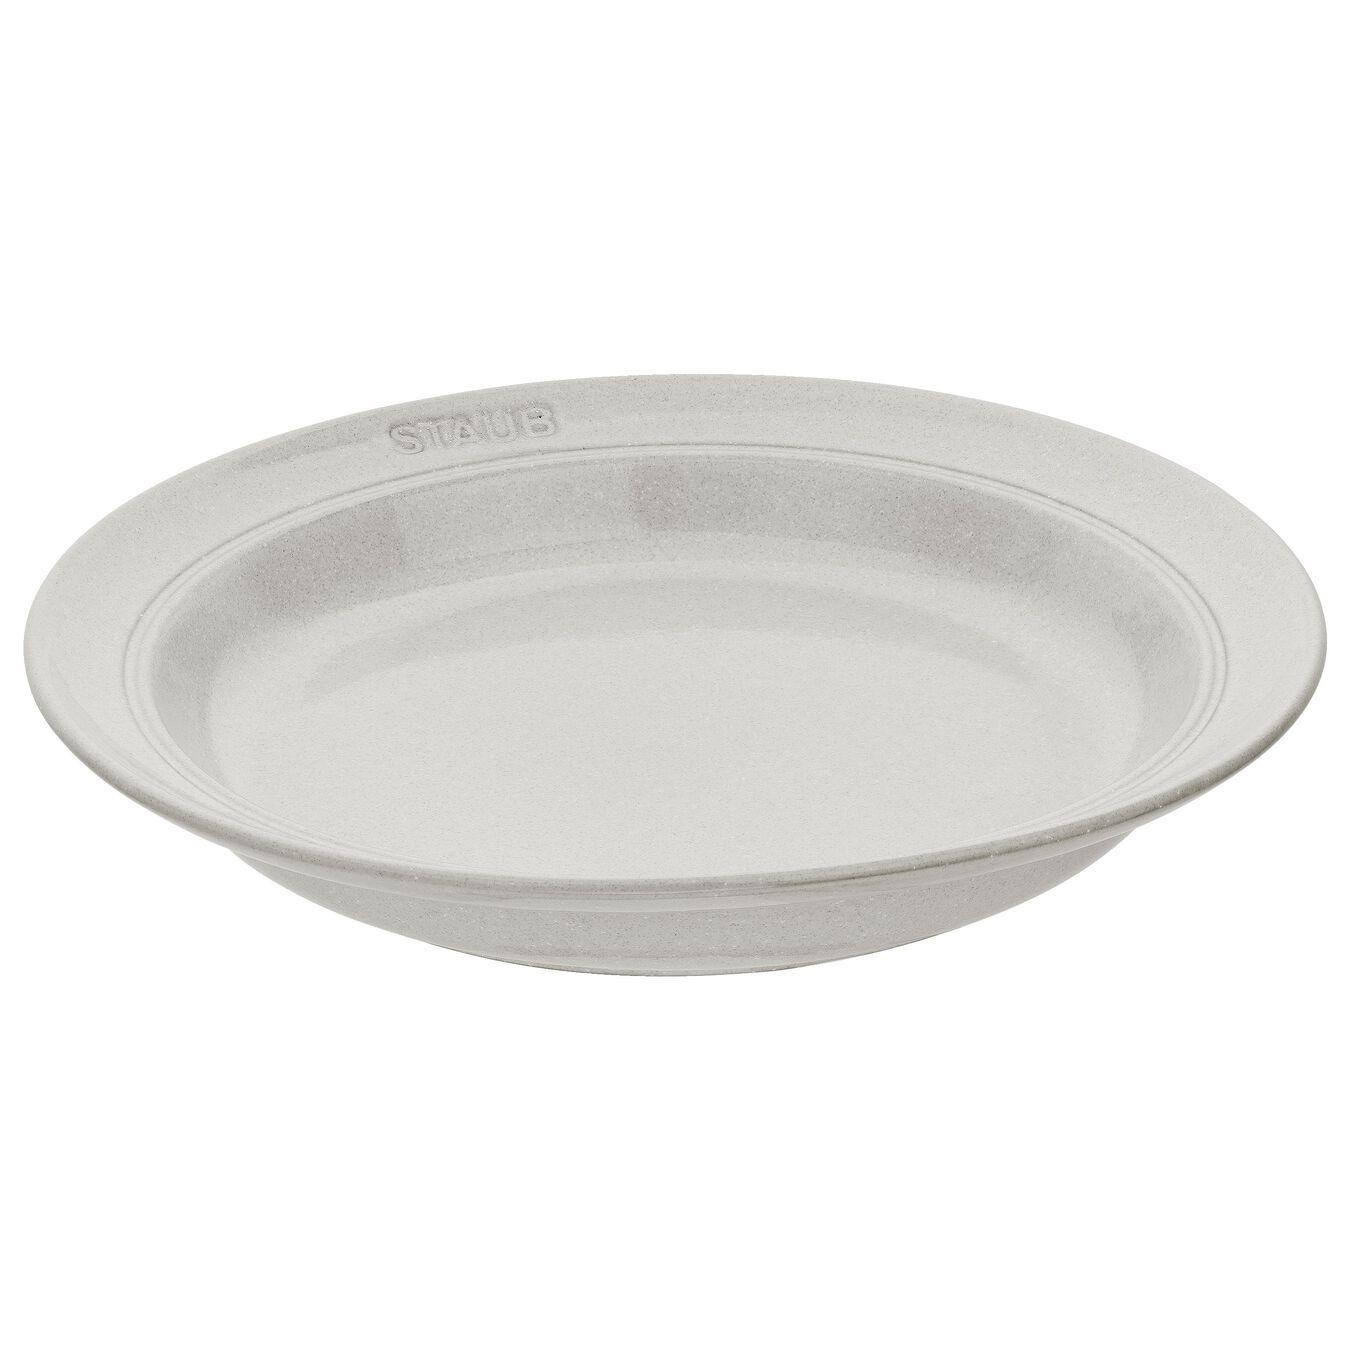 Serving set, 48 Piece | white truffle | Ceramic | Ceramic,,large 3